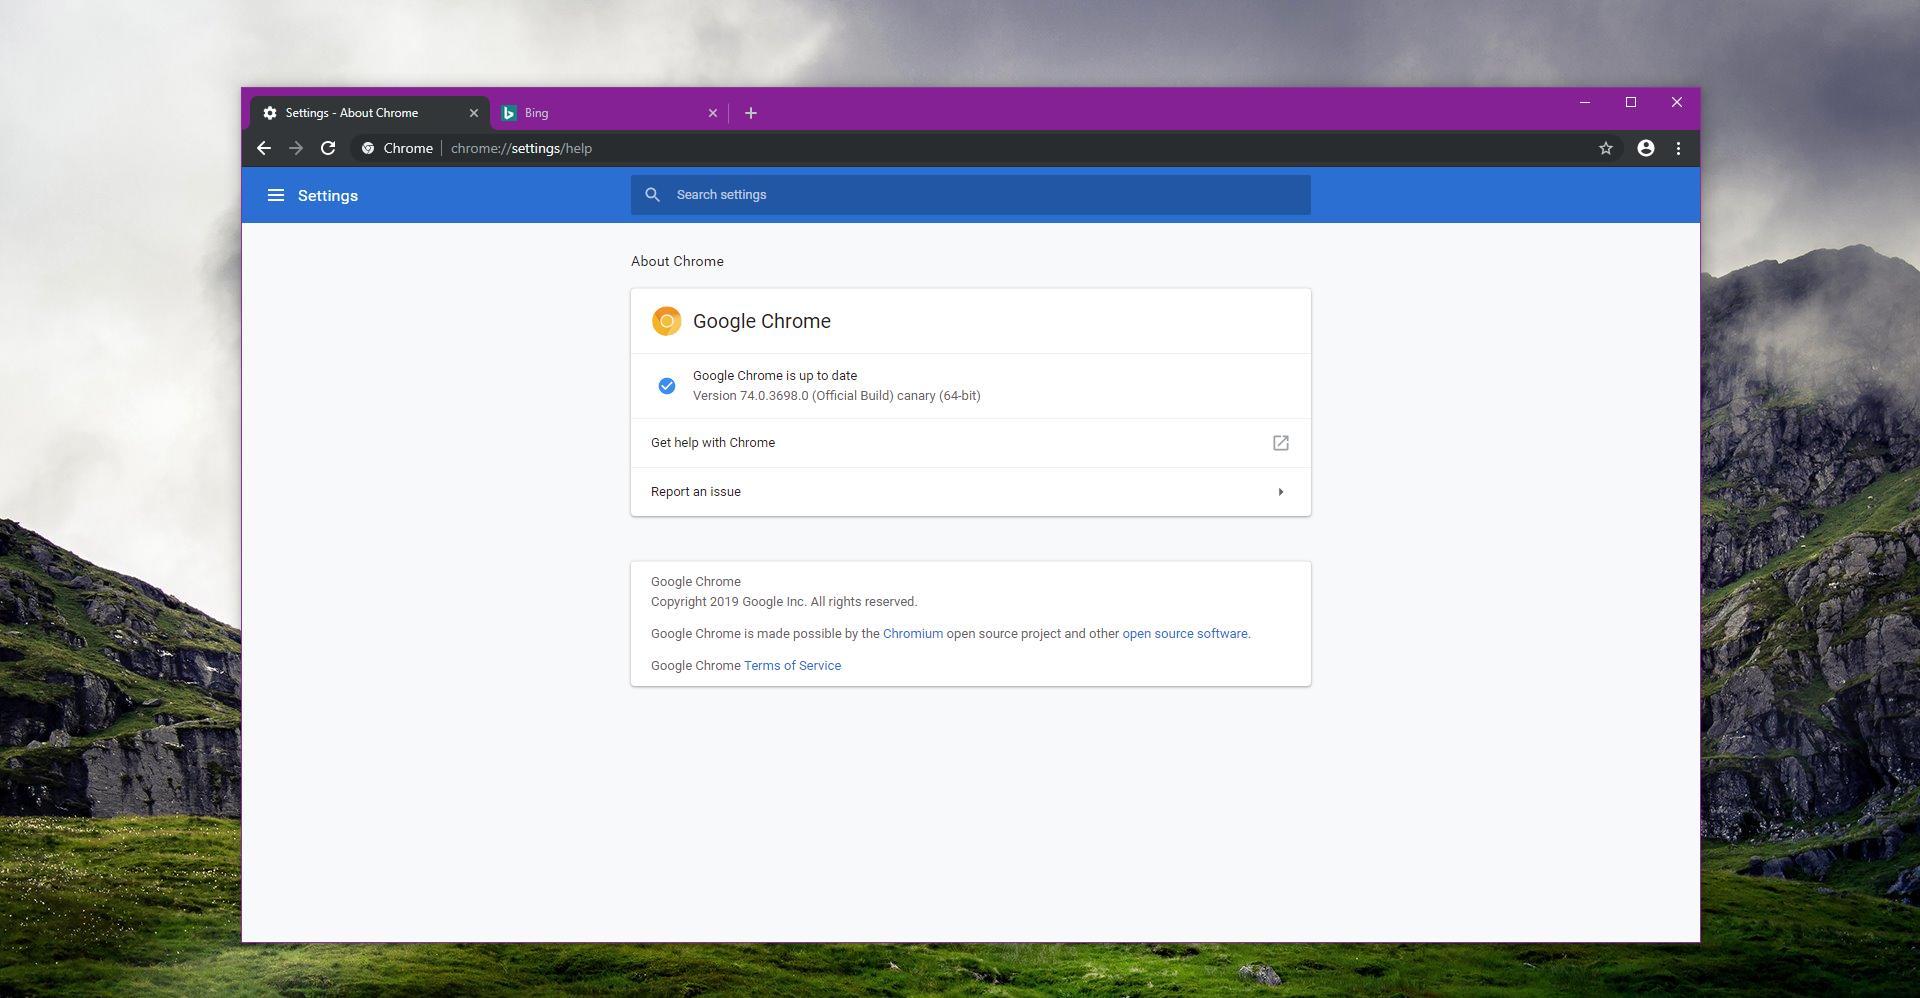 Google Chrome's Dark Theme Gets Key Update on Windows 10 as